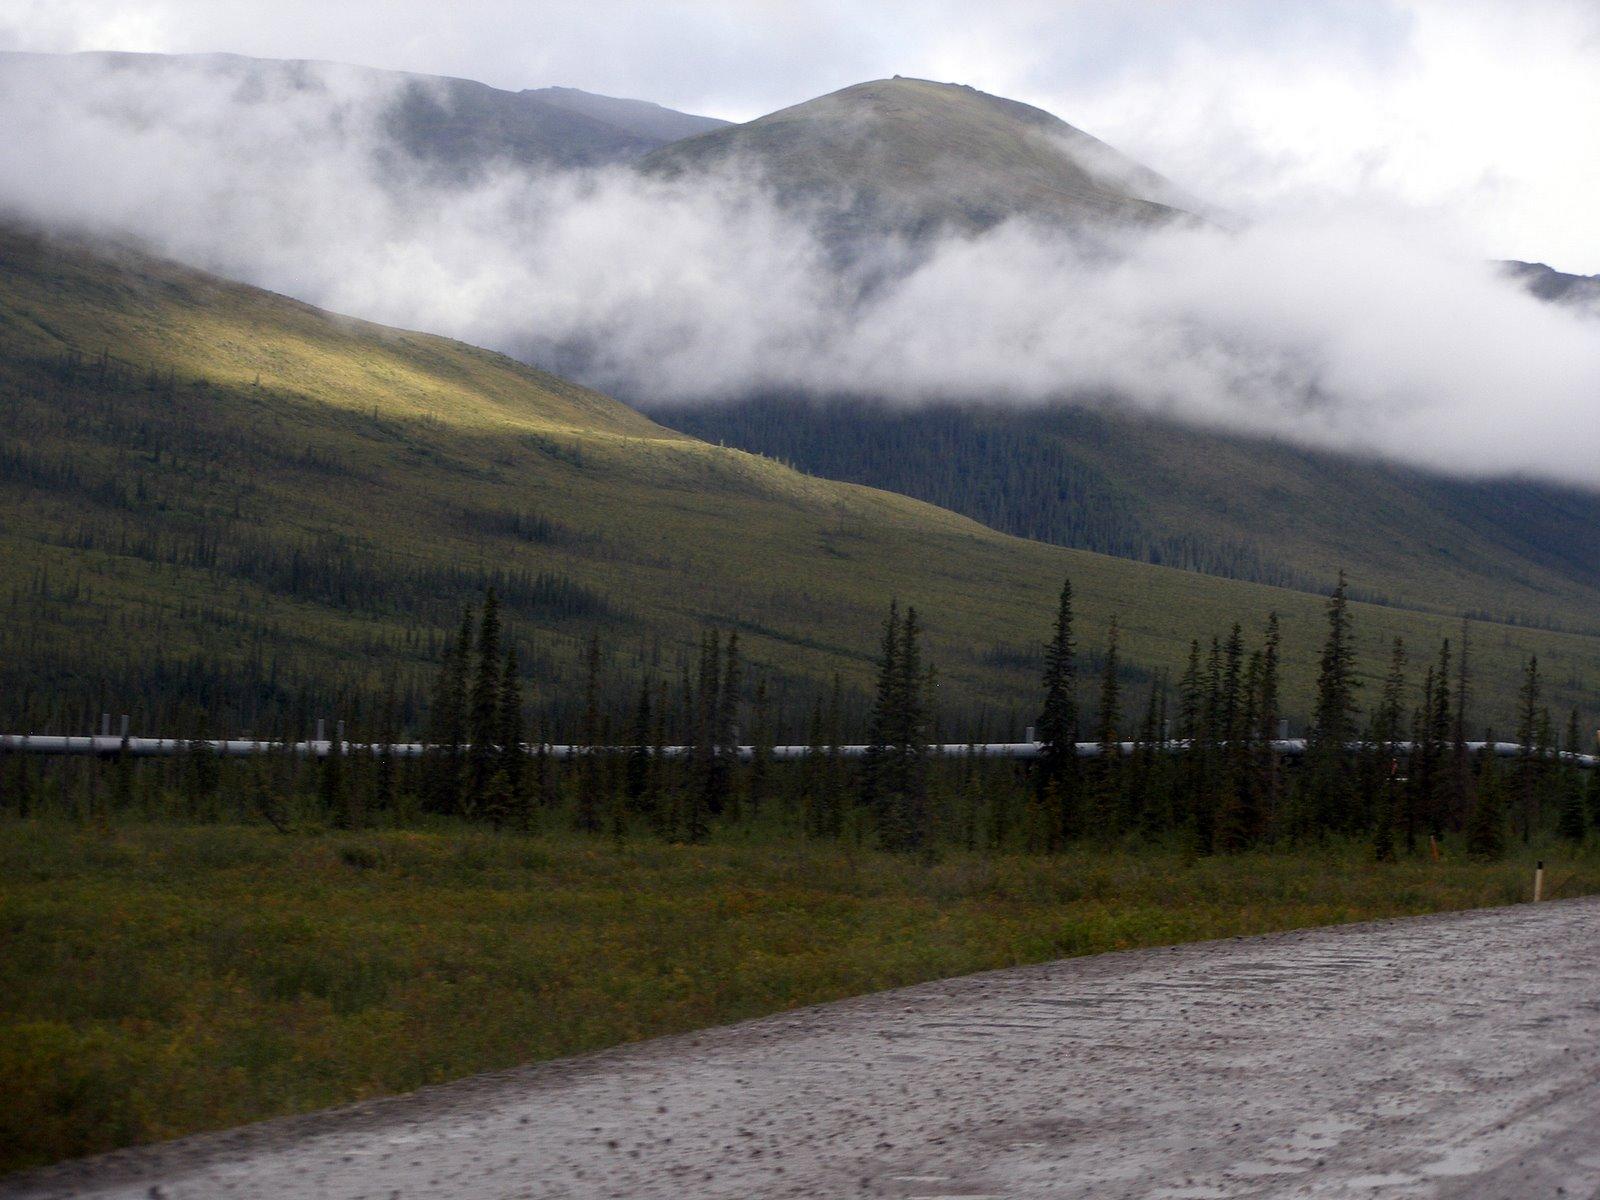 brooks mountain range alaska wallpapers - Brooks Mountain Range Alaska #6938415 7 Themes